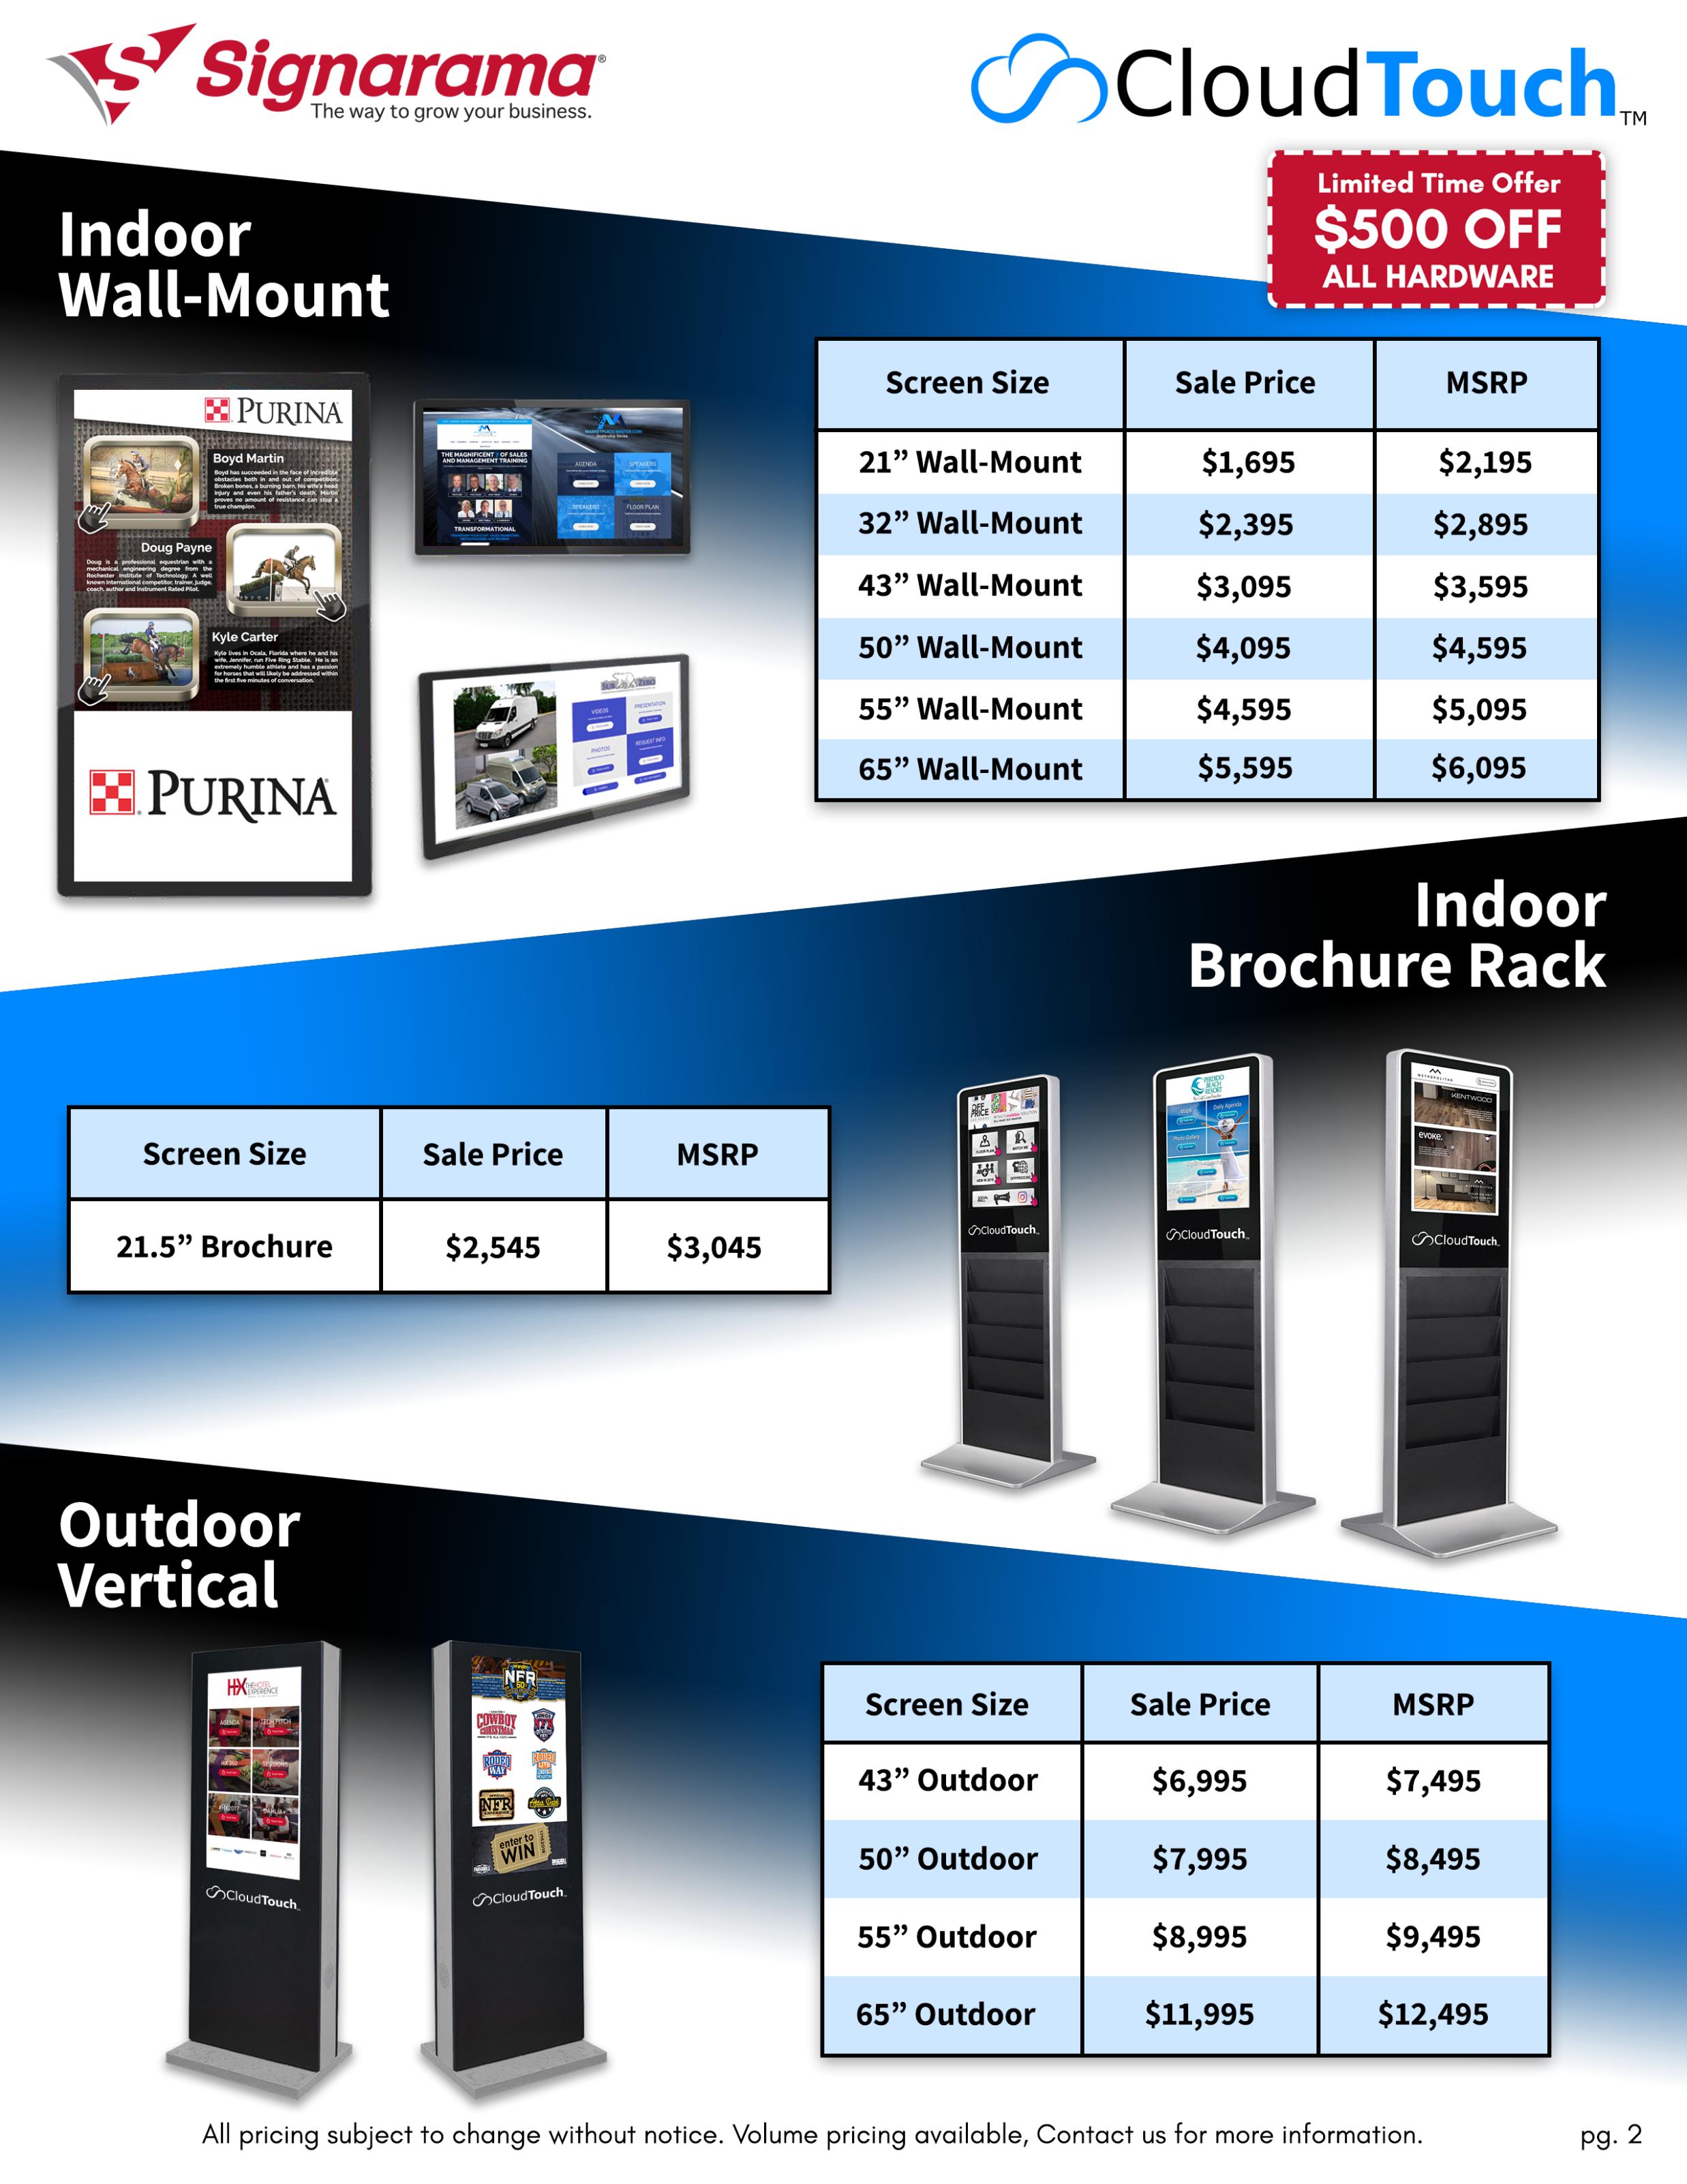 SAR-CT-Retail-Pricing-2-Flyer (1)_002